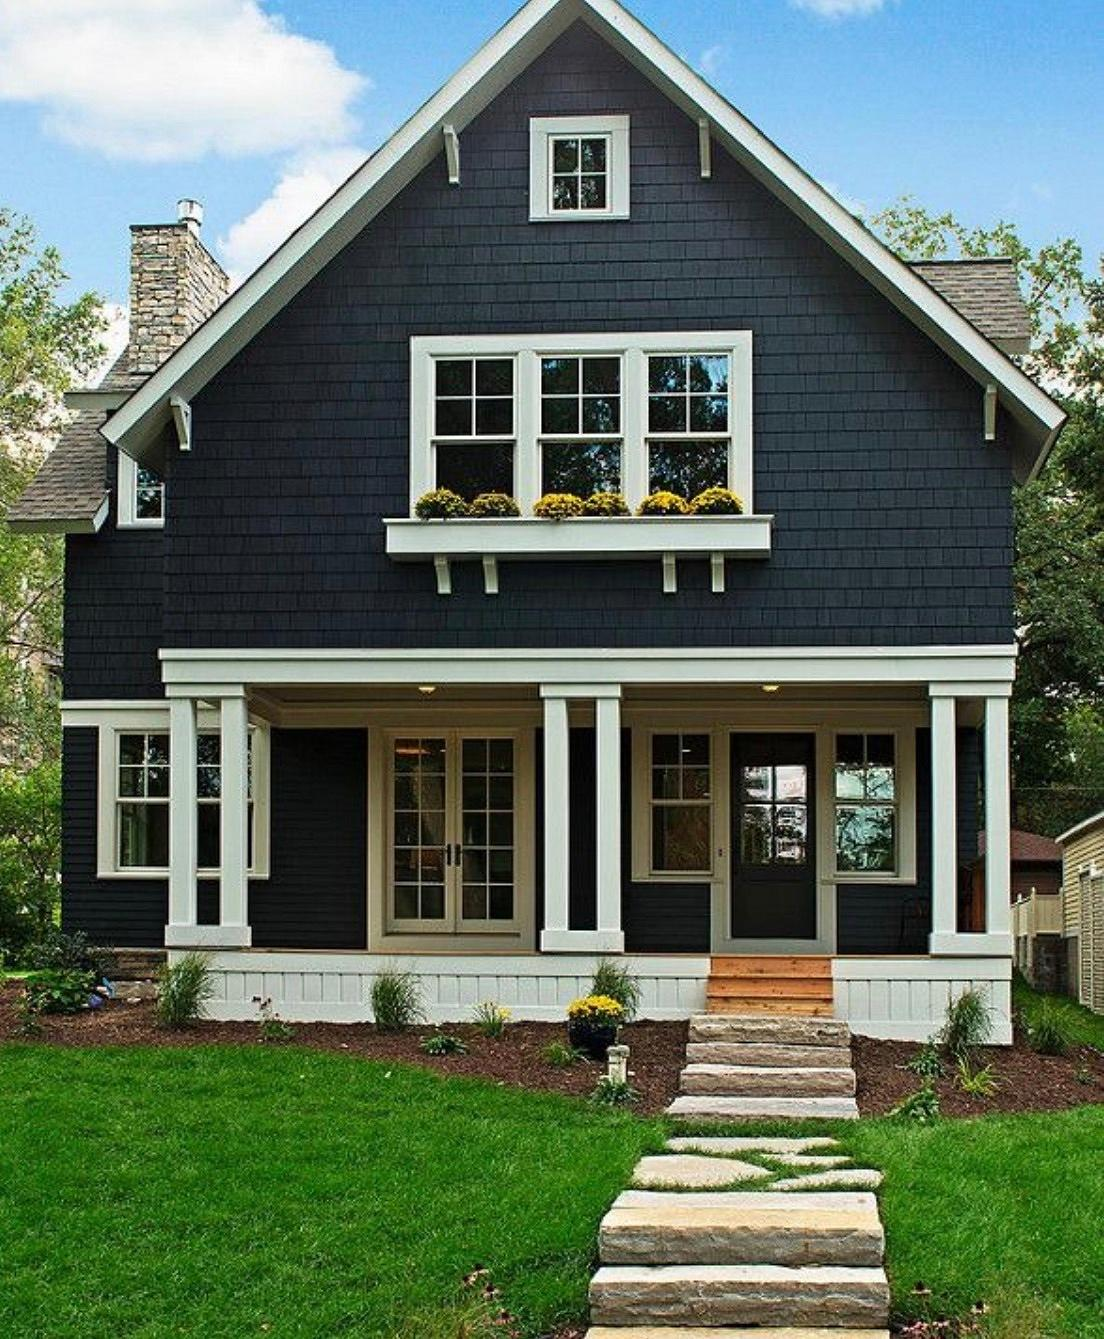 Residential Exterior Services: Phoenix Paint Services